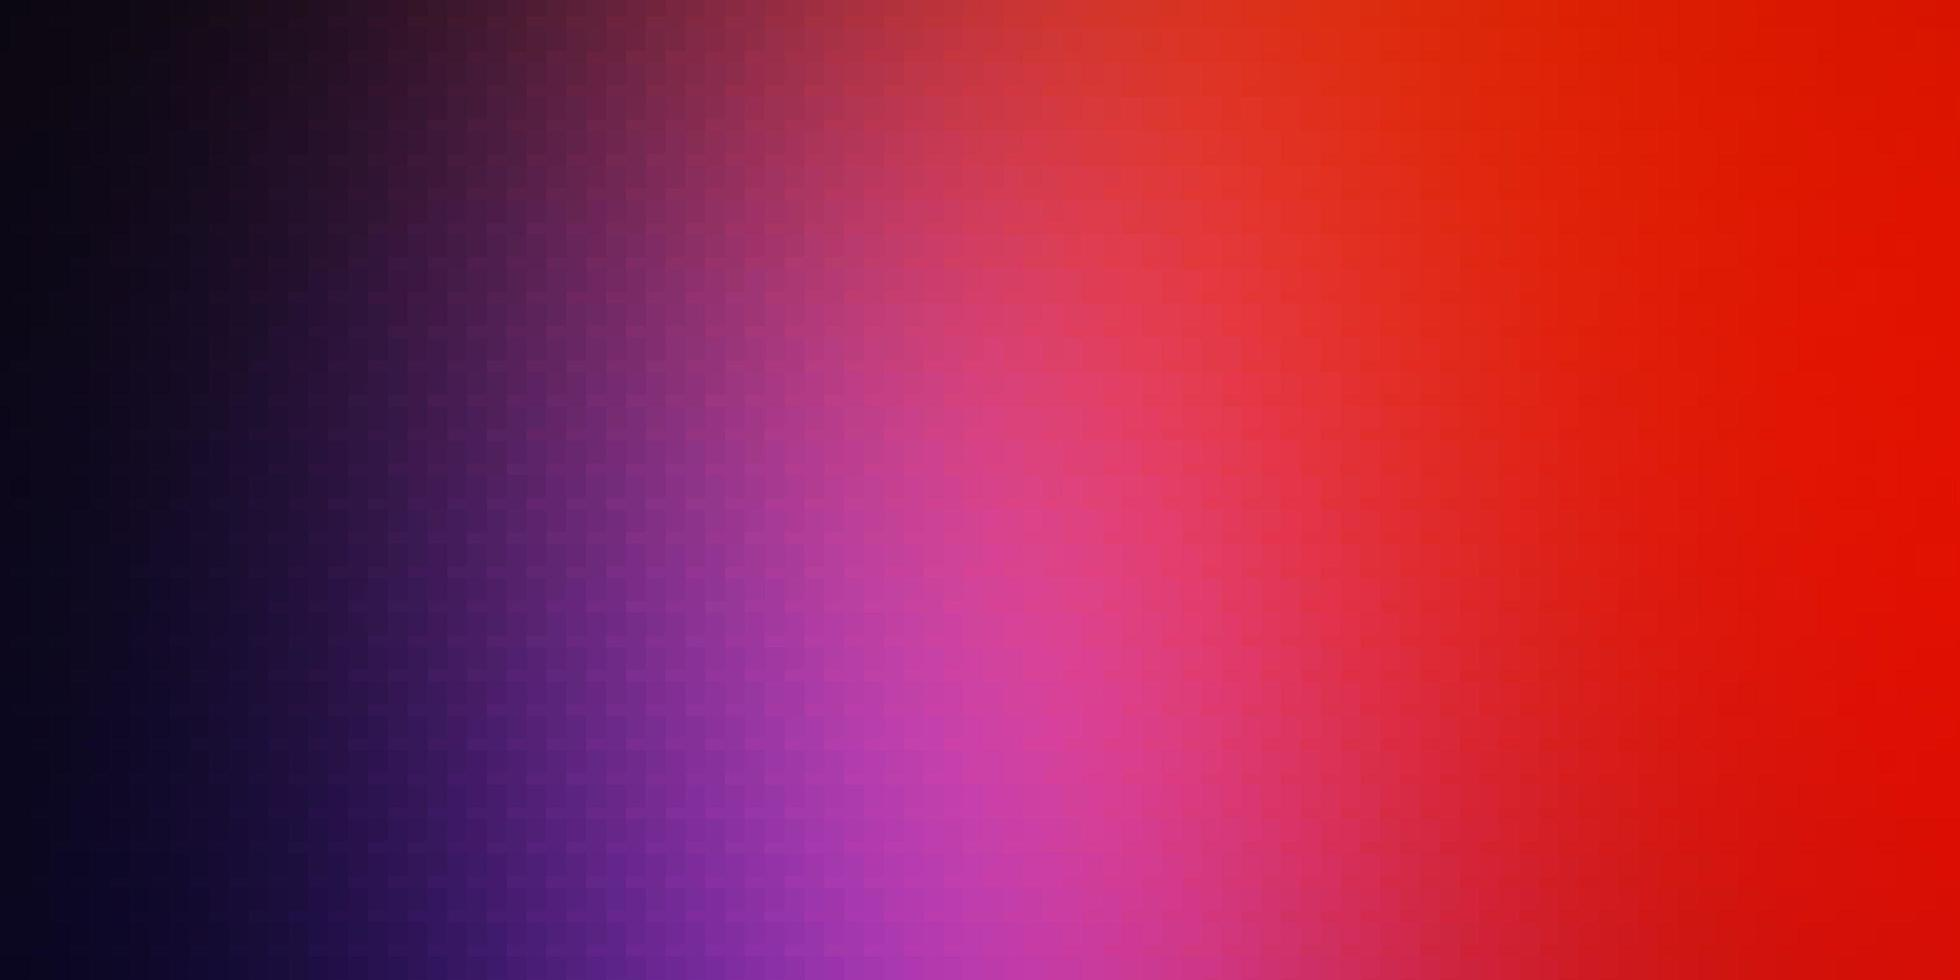 hellrosa, rote Vektorschablone in Rechtecken. vektor